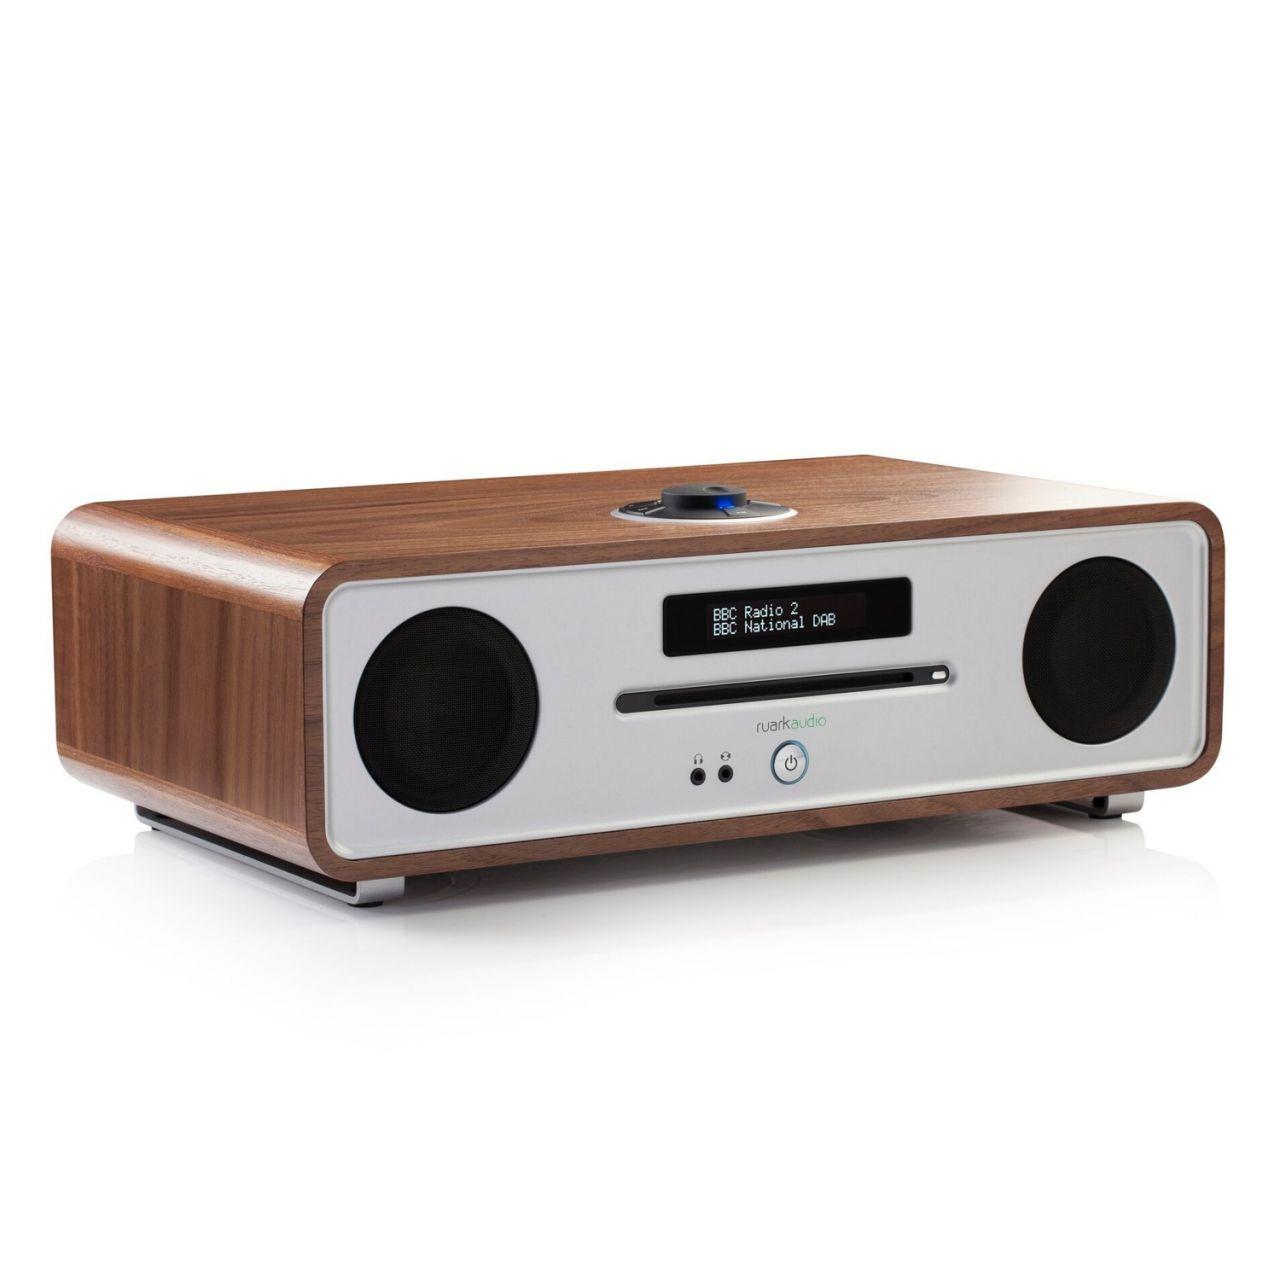 ruark audio - Stereoanlage R4 9030